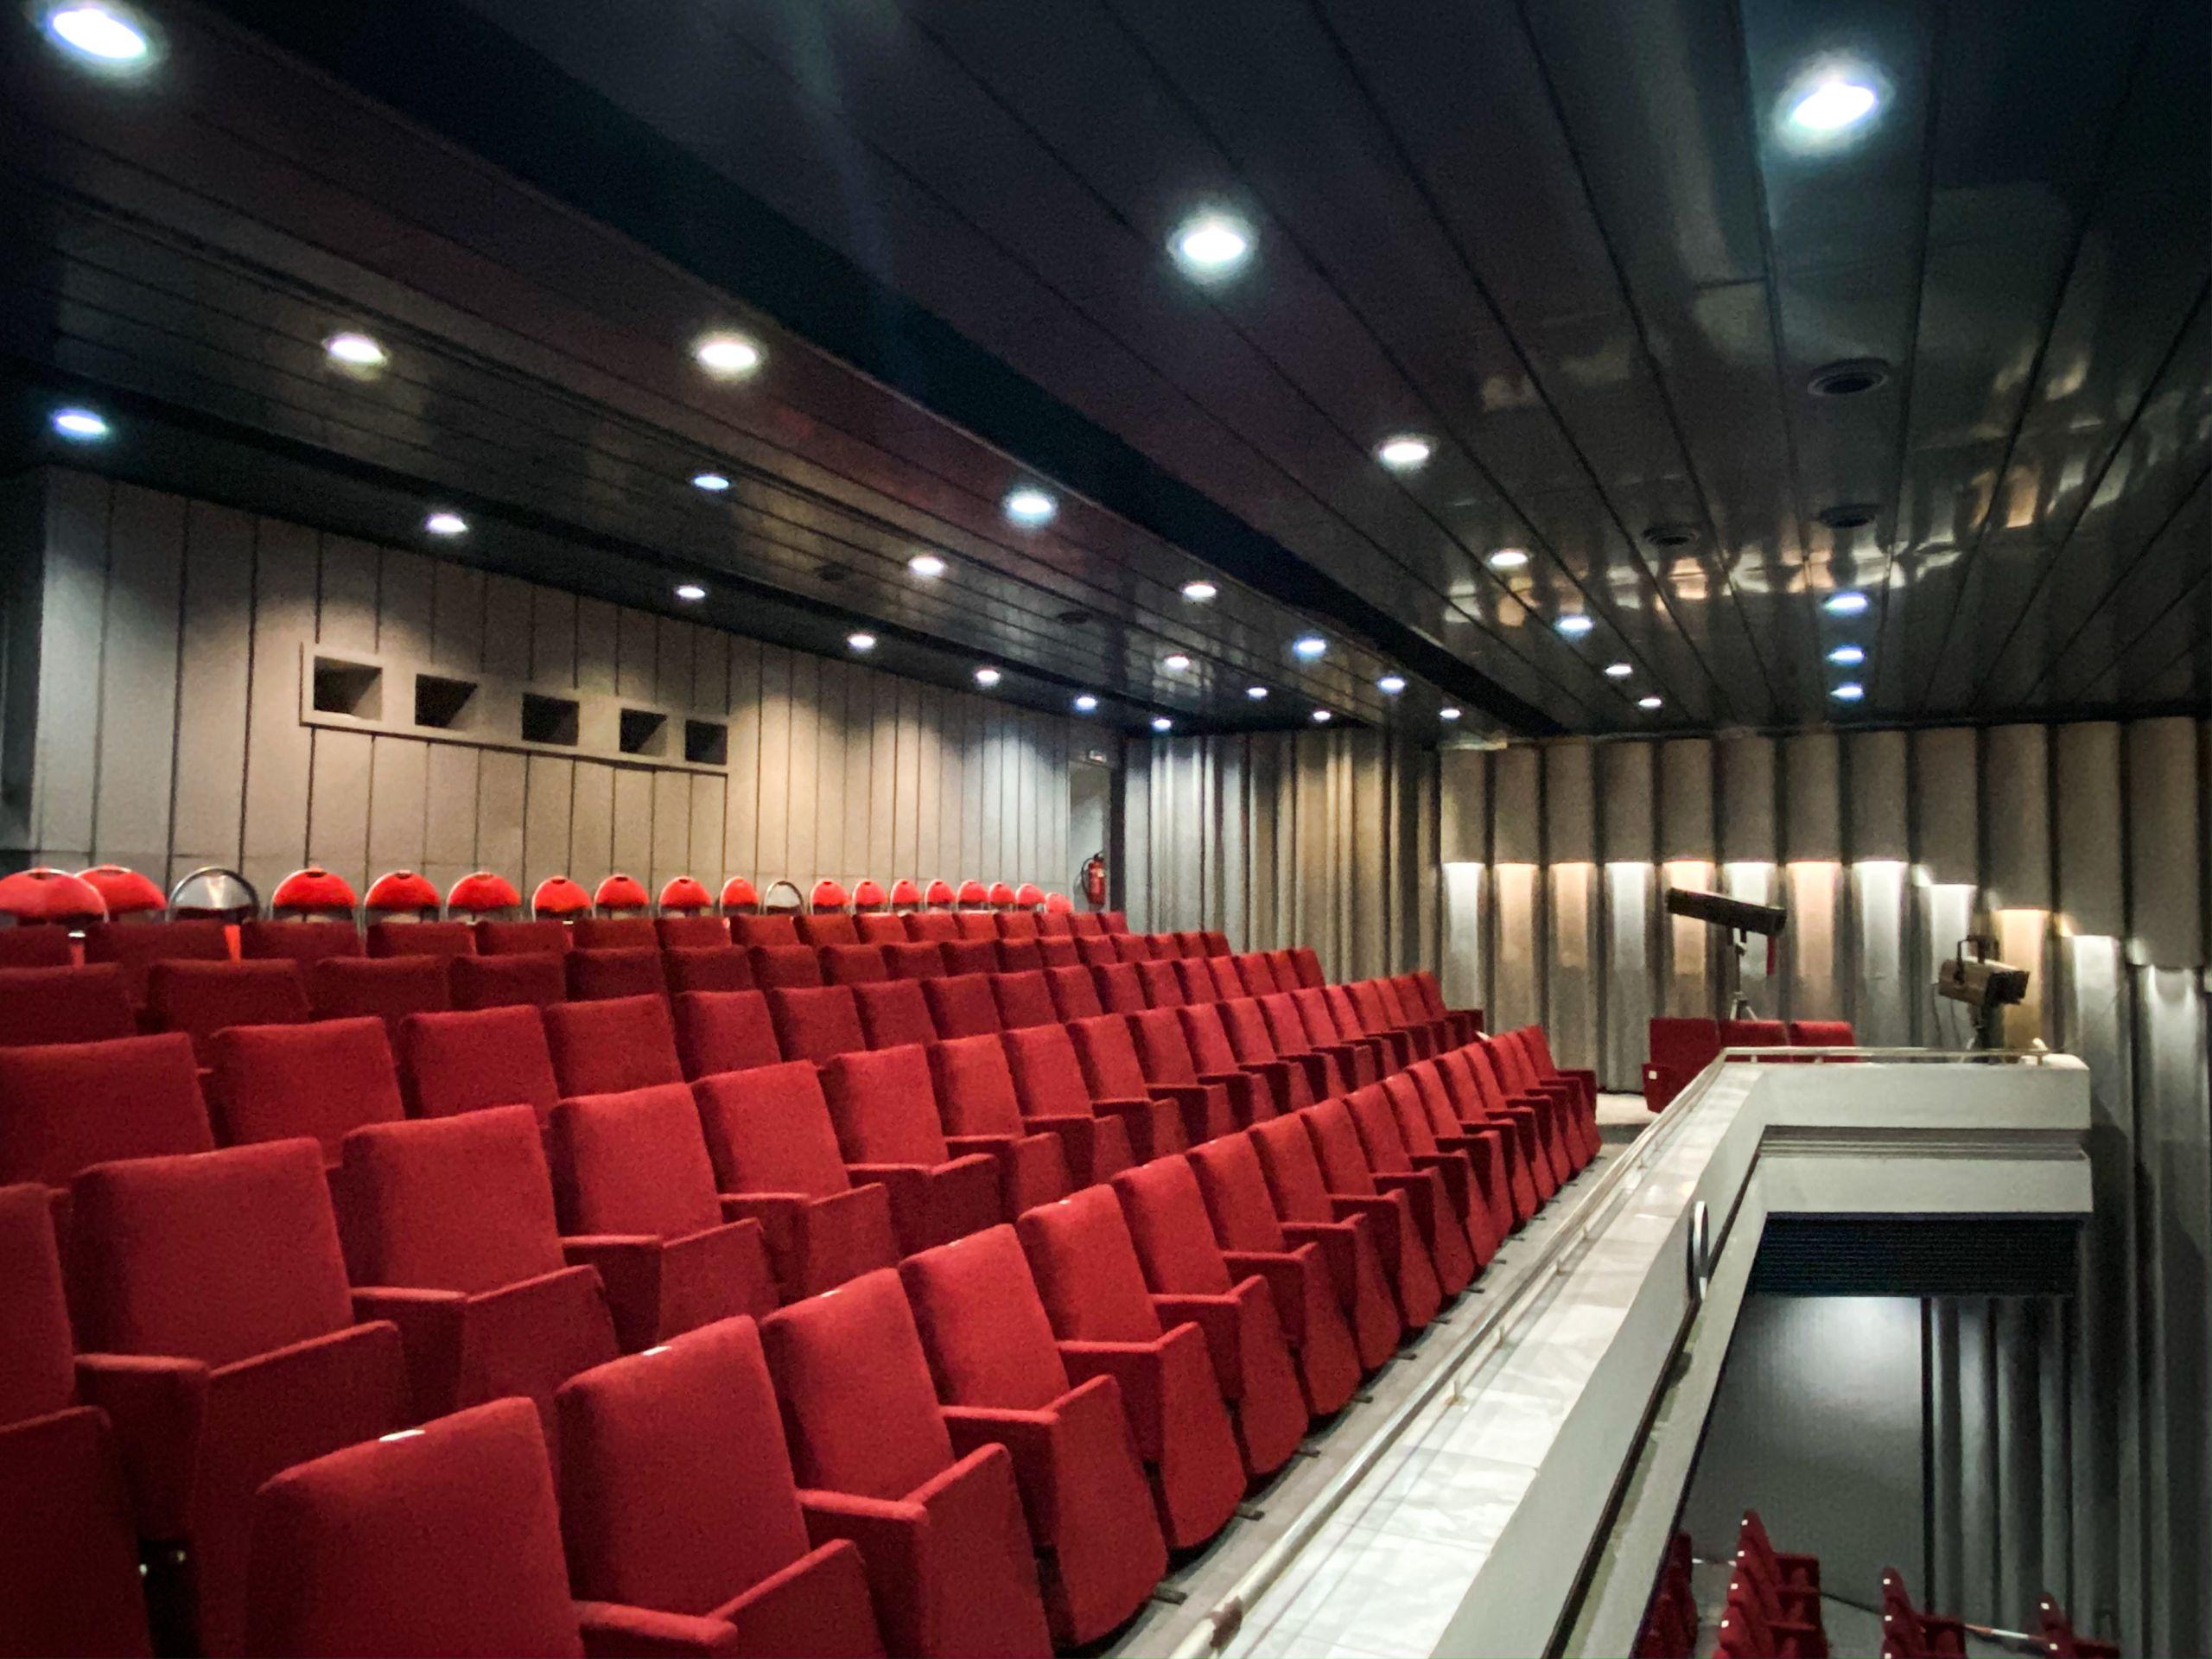 Kino Teatur Osvobojdenie 15